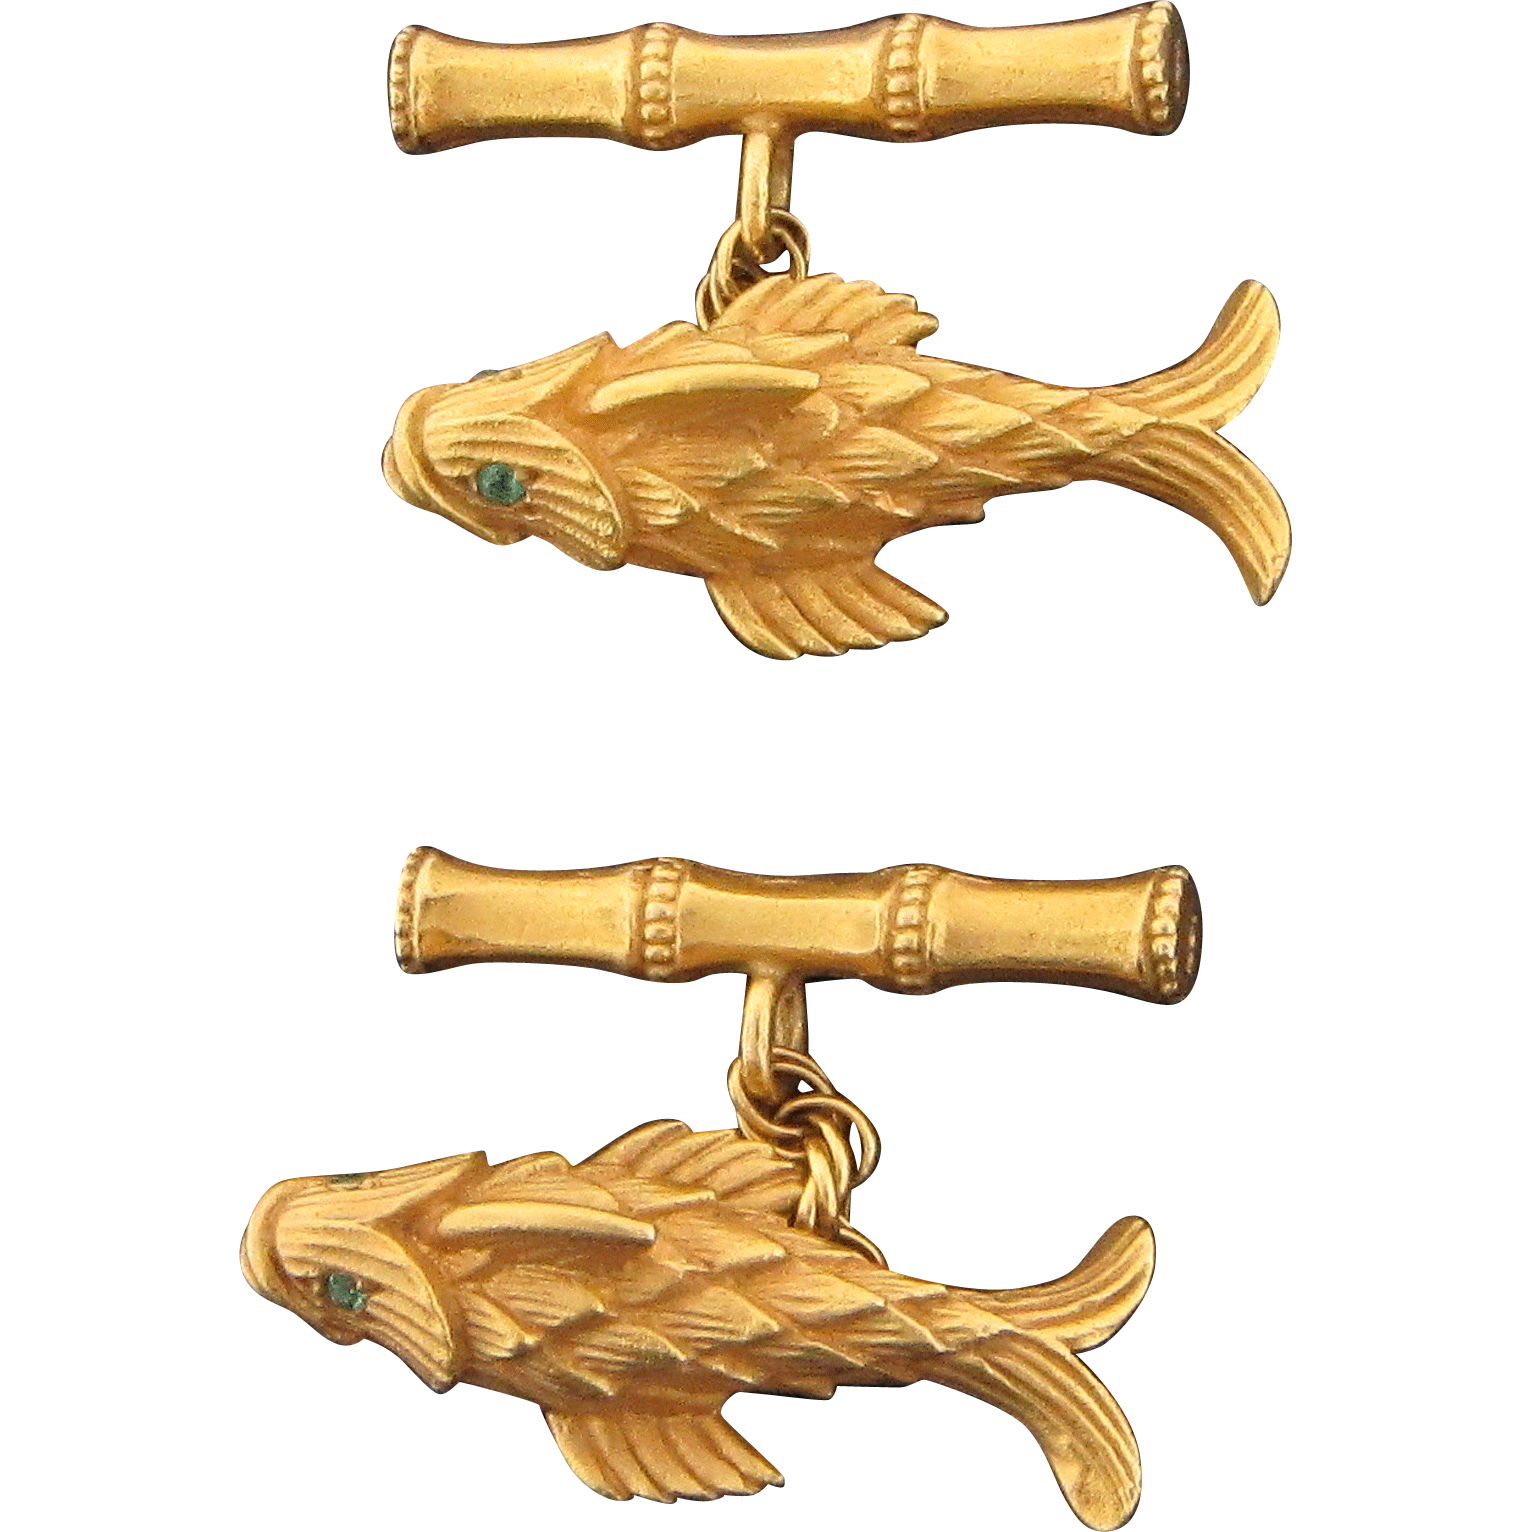 14 Karat Yellow Gold Emerald Eyed Fish Design Cufflinks